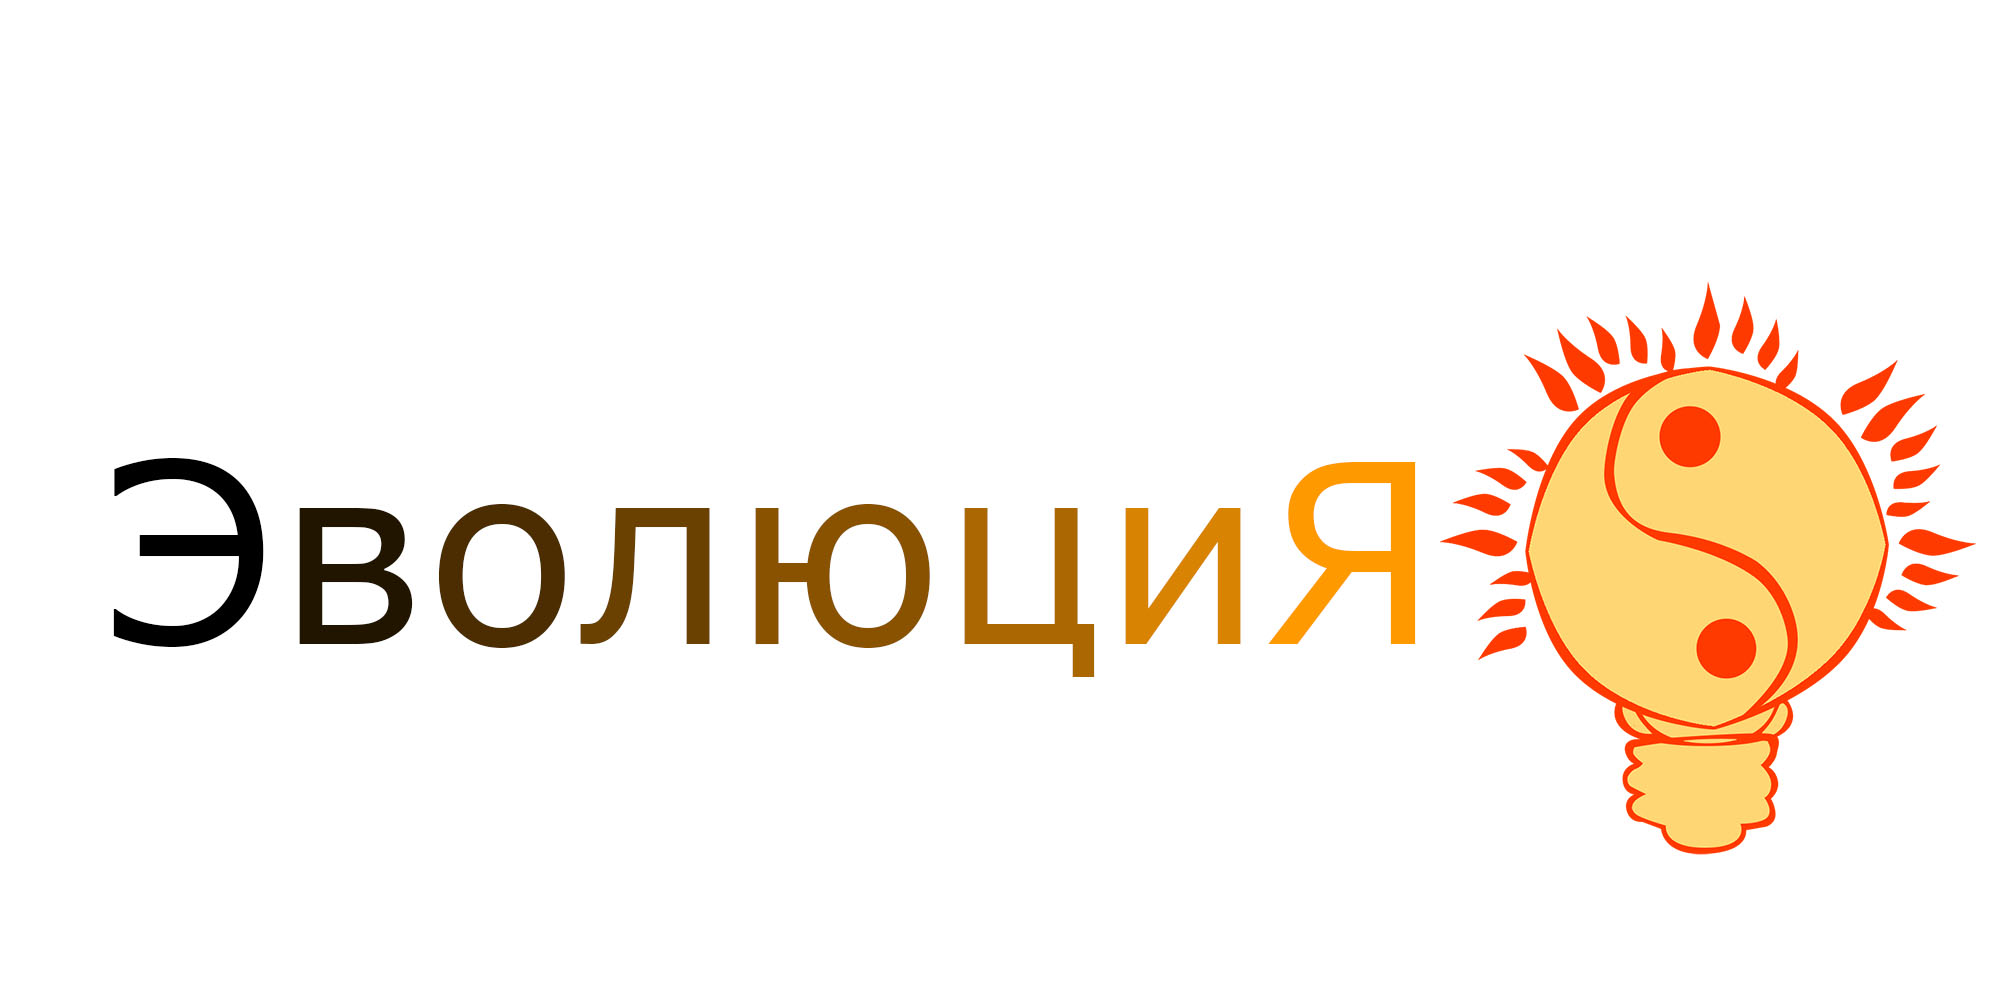 Разработать логотип фото f_3885bc9de7471ac3.jpg